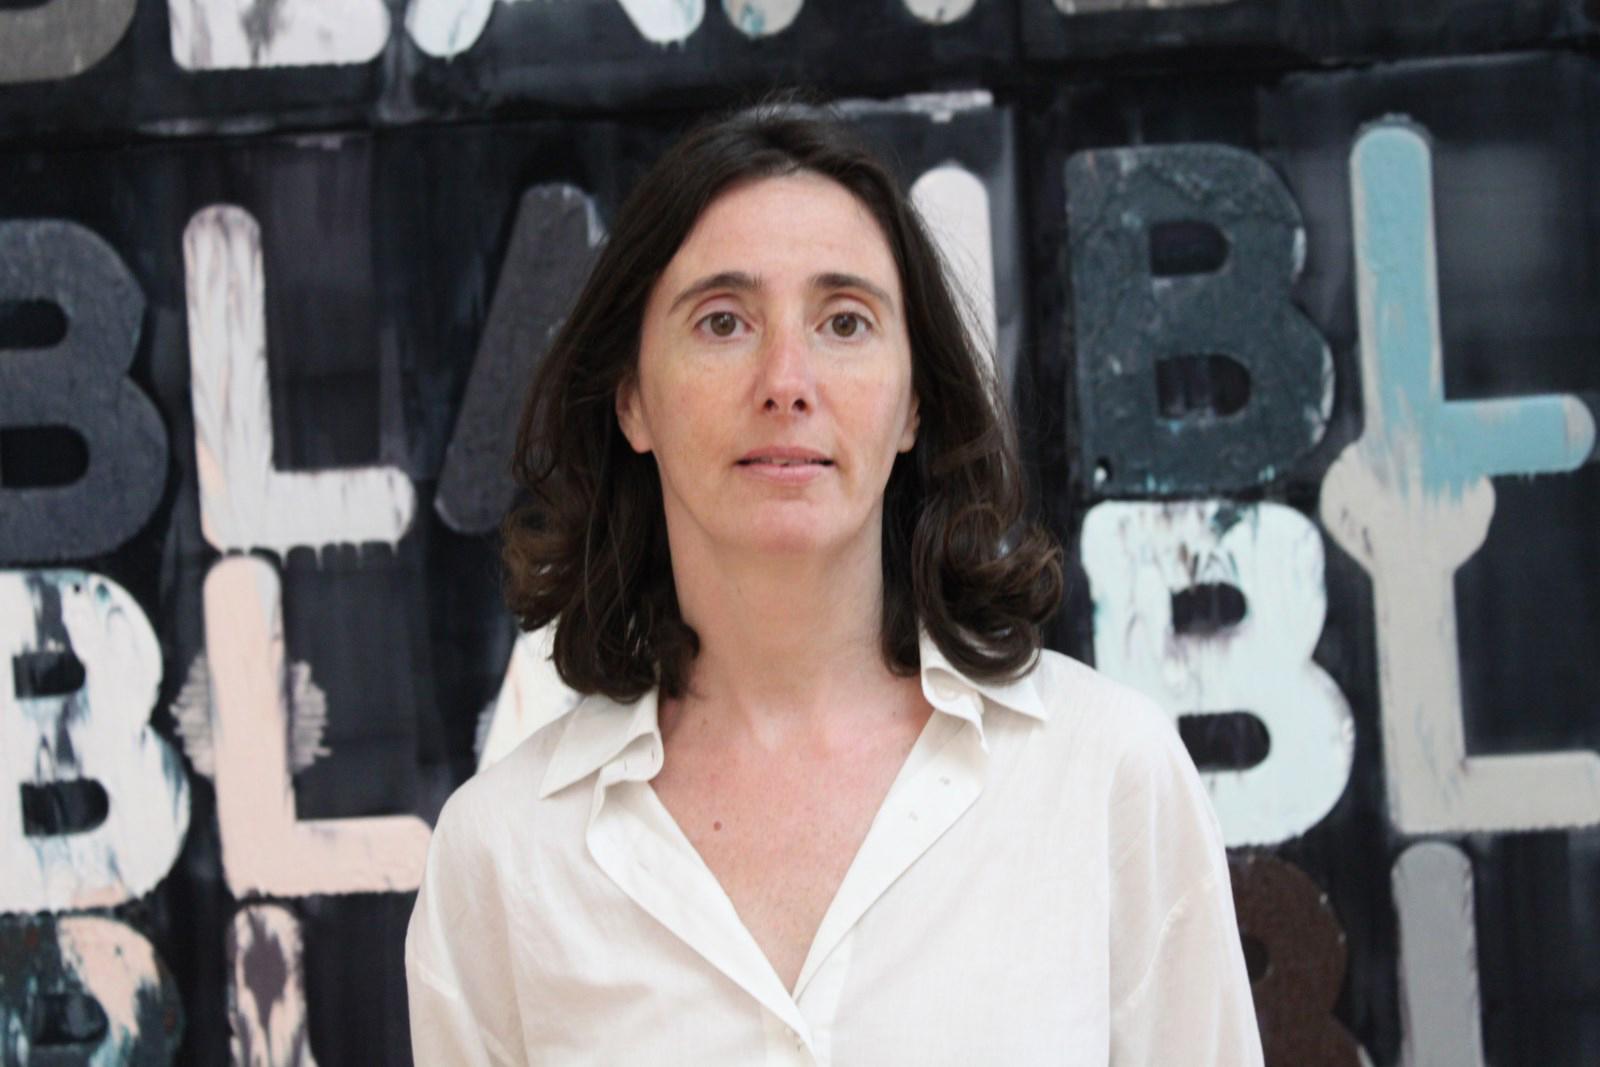 NataliaCarreroBlaok